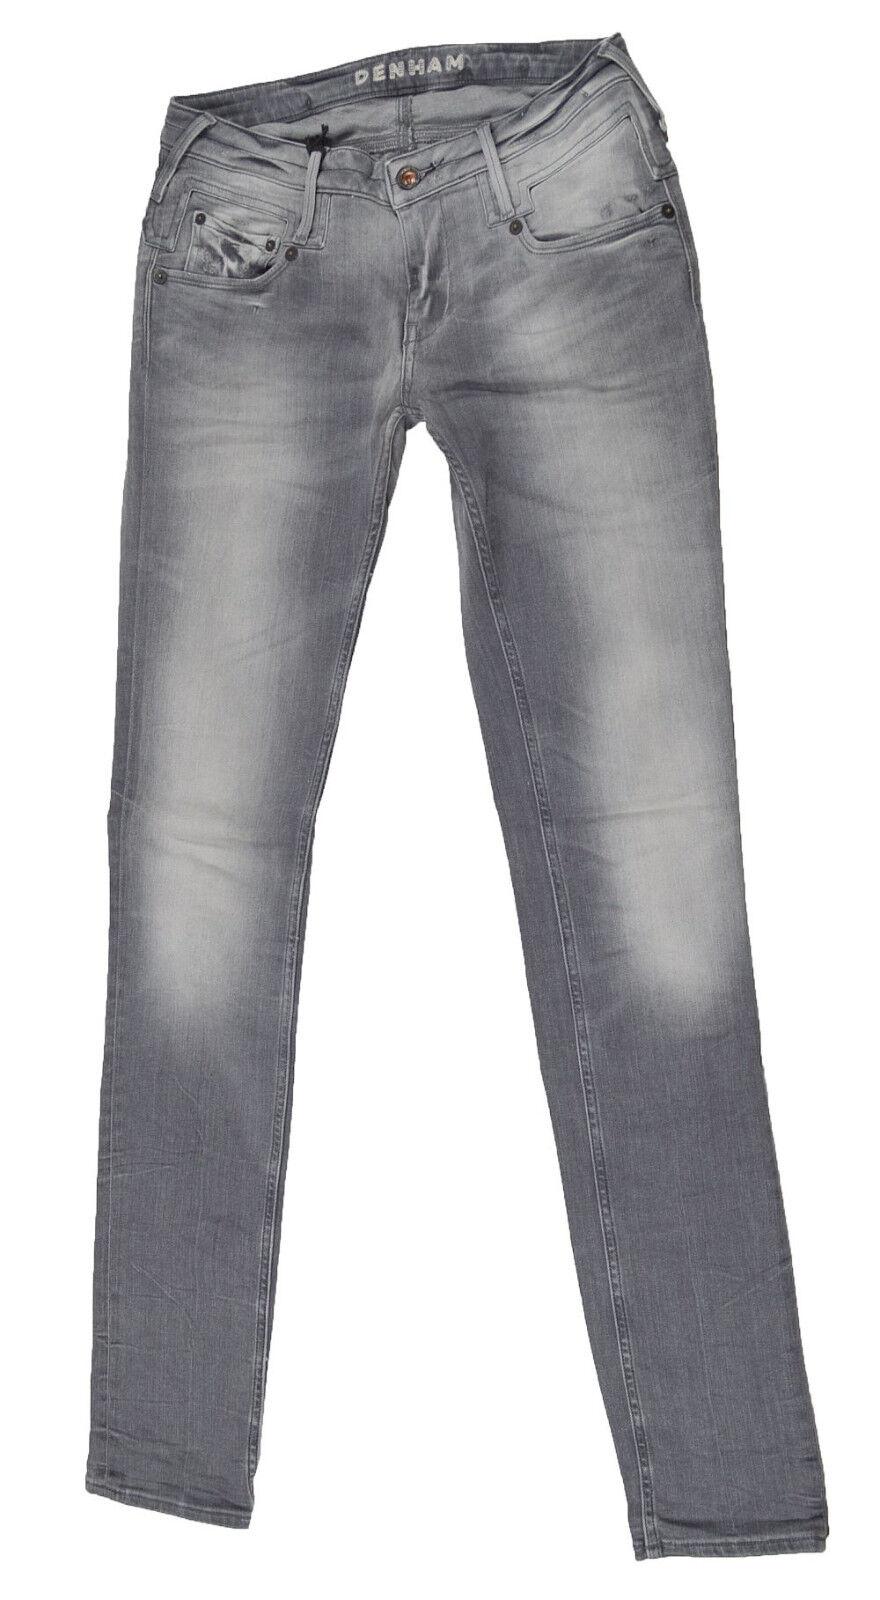 Denham Skinny+ 3YG Damen Jeans Hose outlet jeans hosen sale 1-110